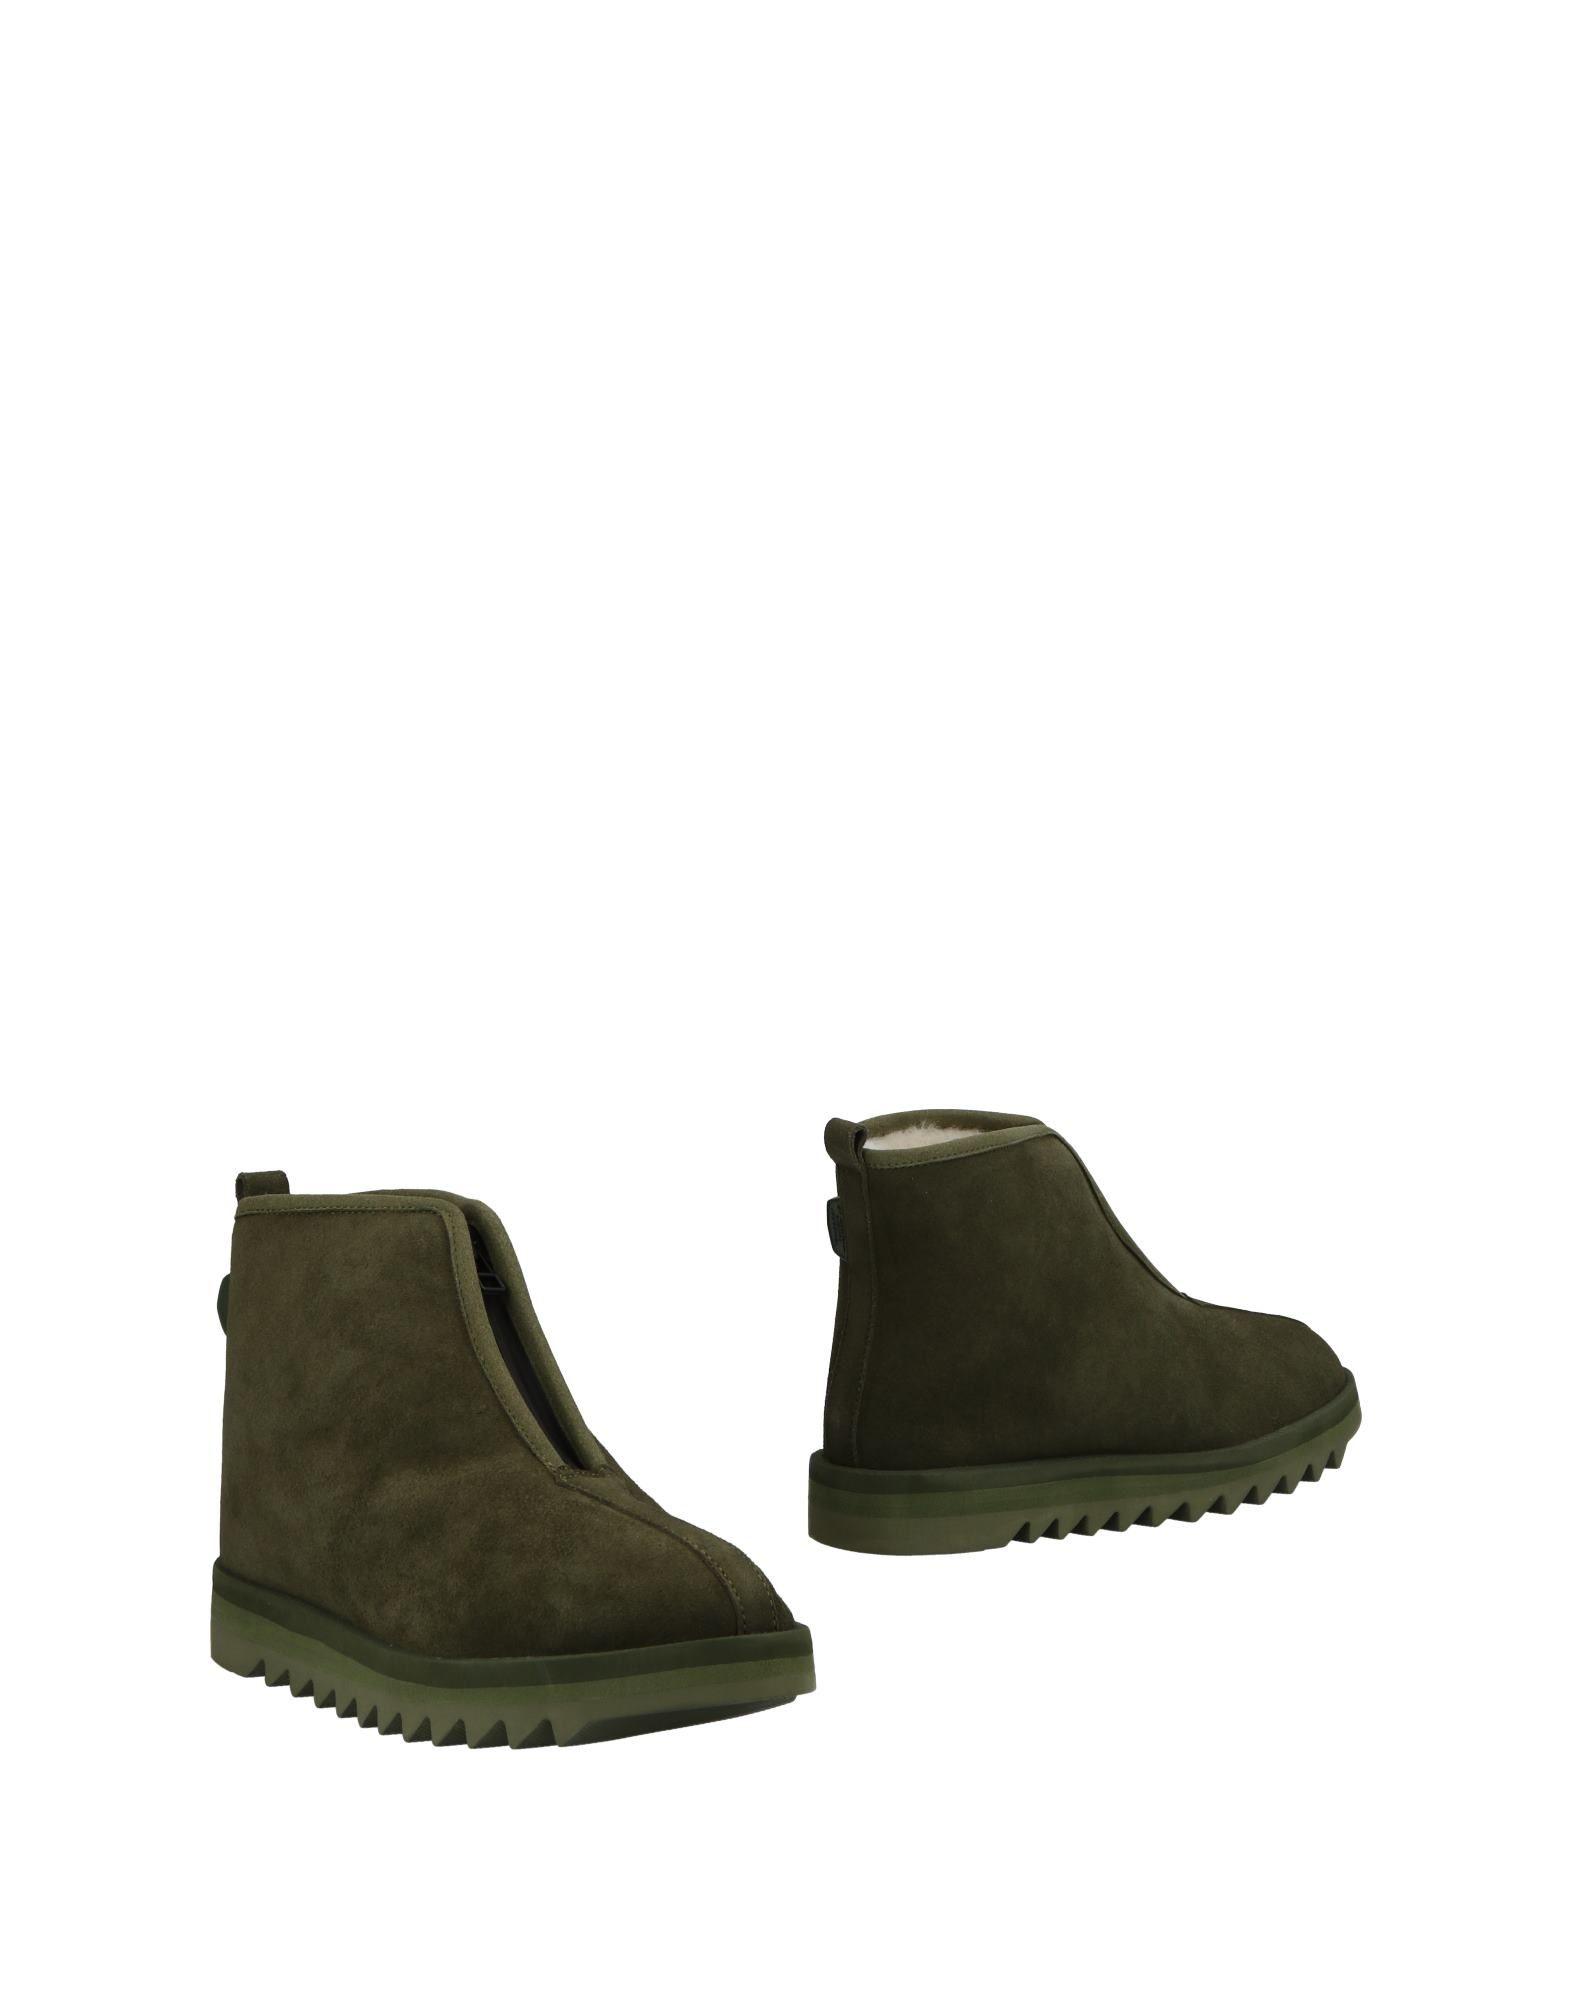 Stilvolle billige Schuhe Suicoke Stiefelette 11498314QG Damen  11498314QG Stiefelette 93284e